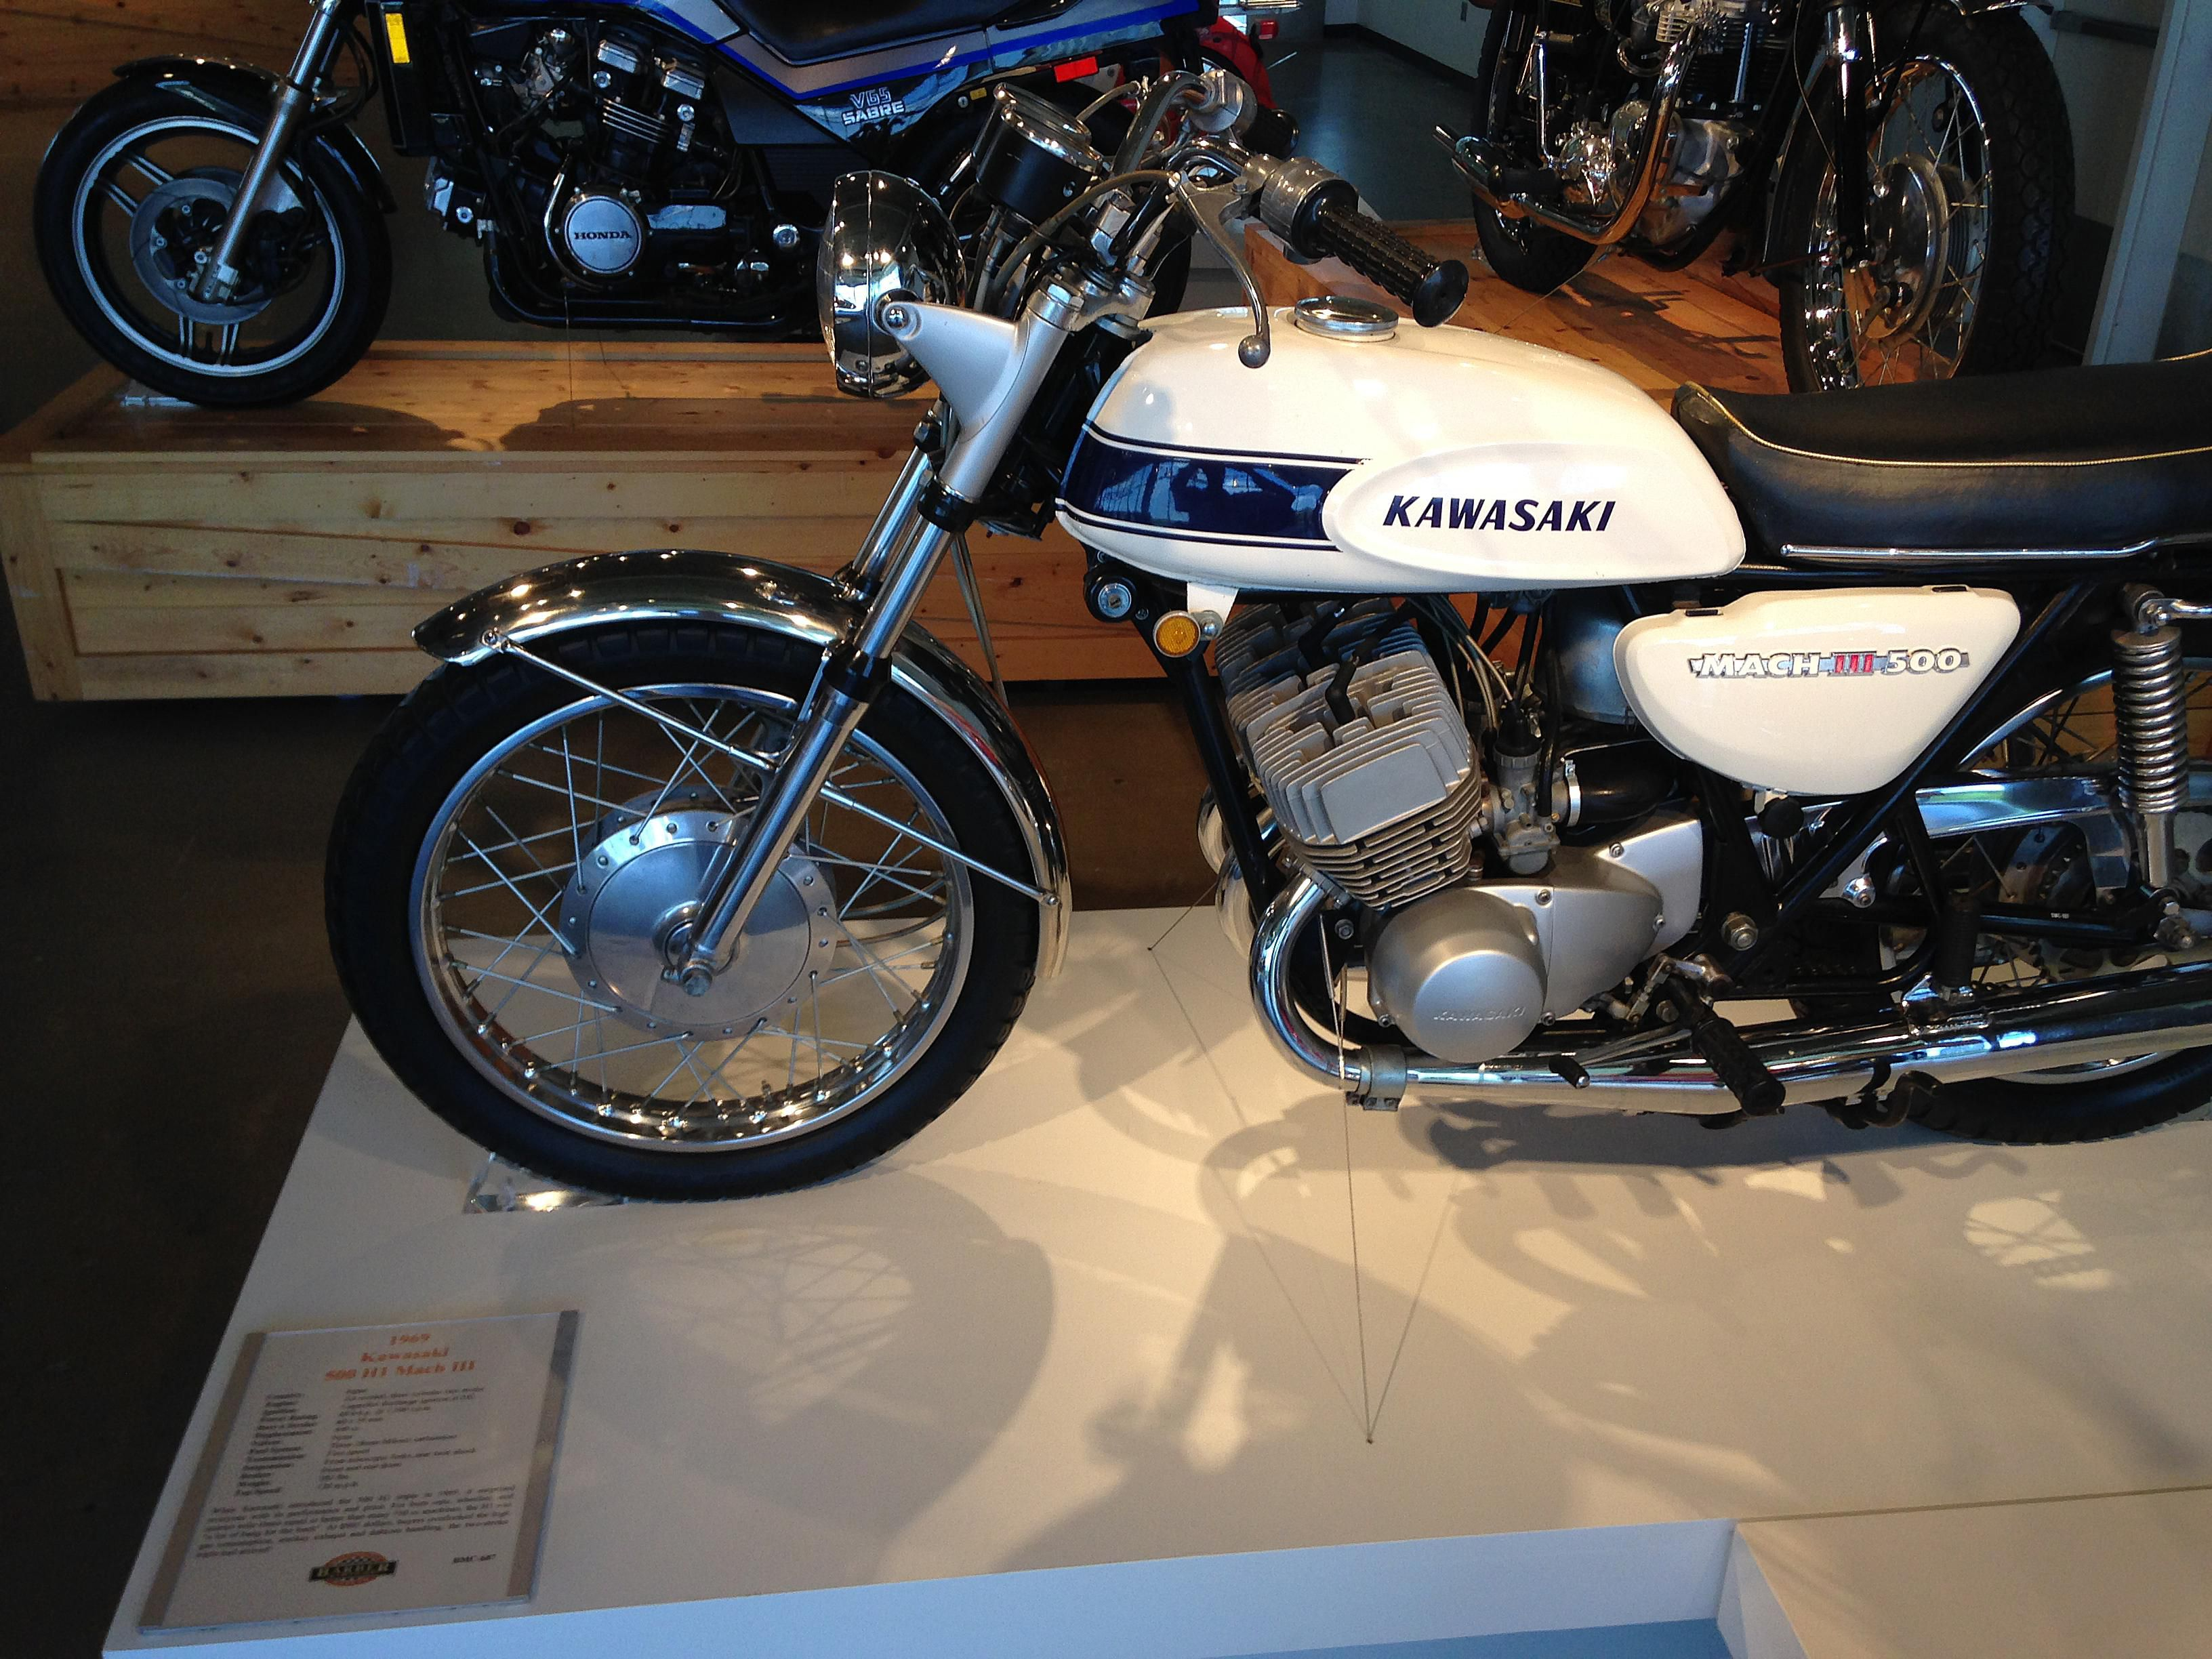 Kawasaki Mach 111 500 on display in museum.